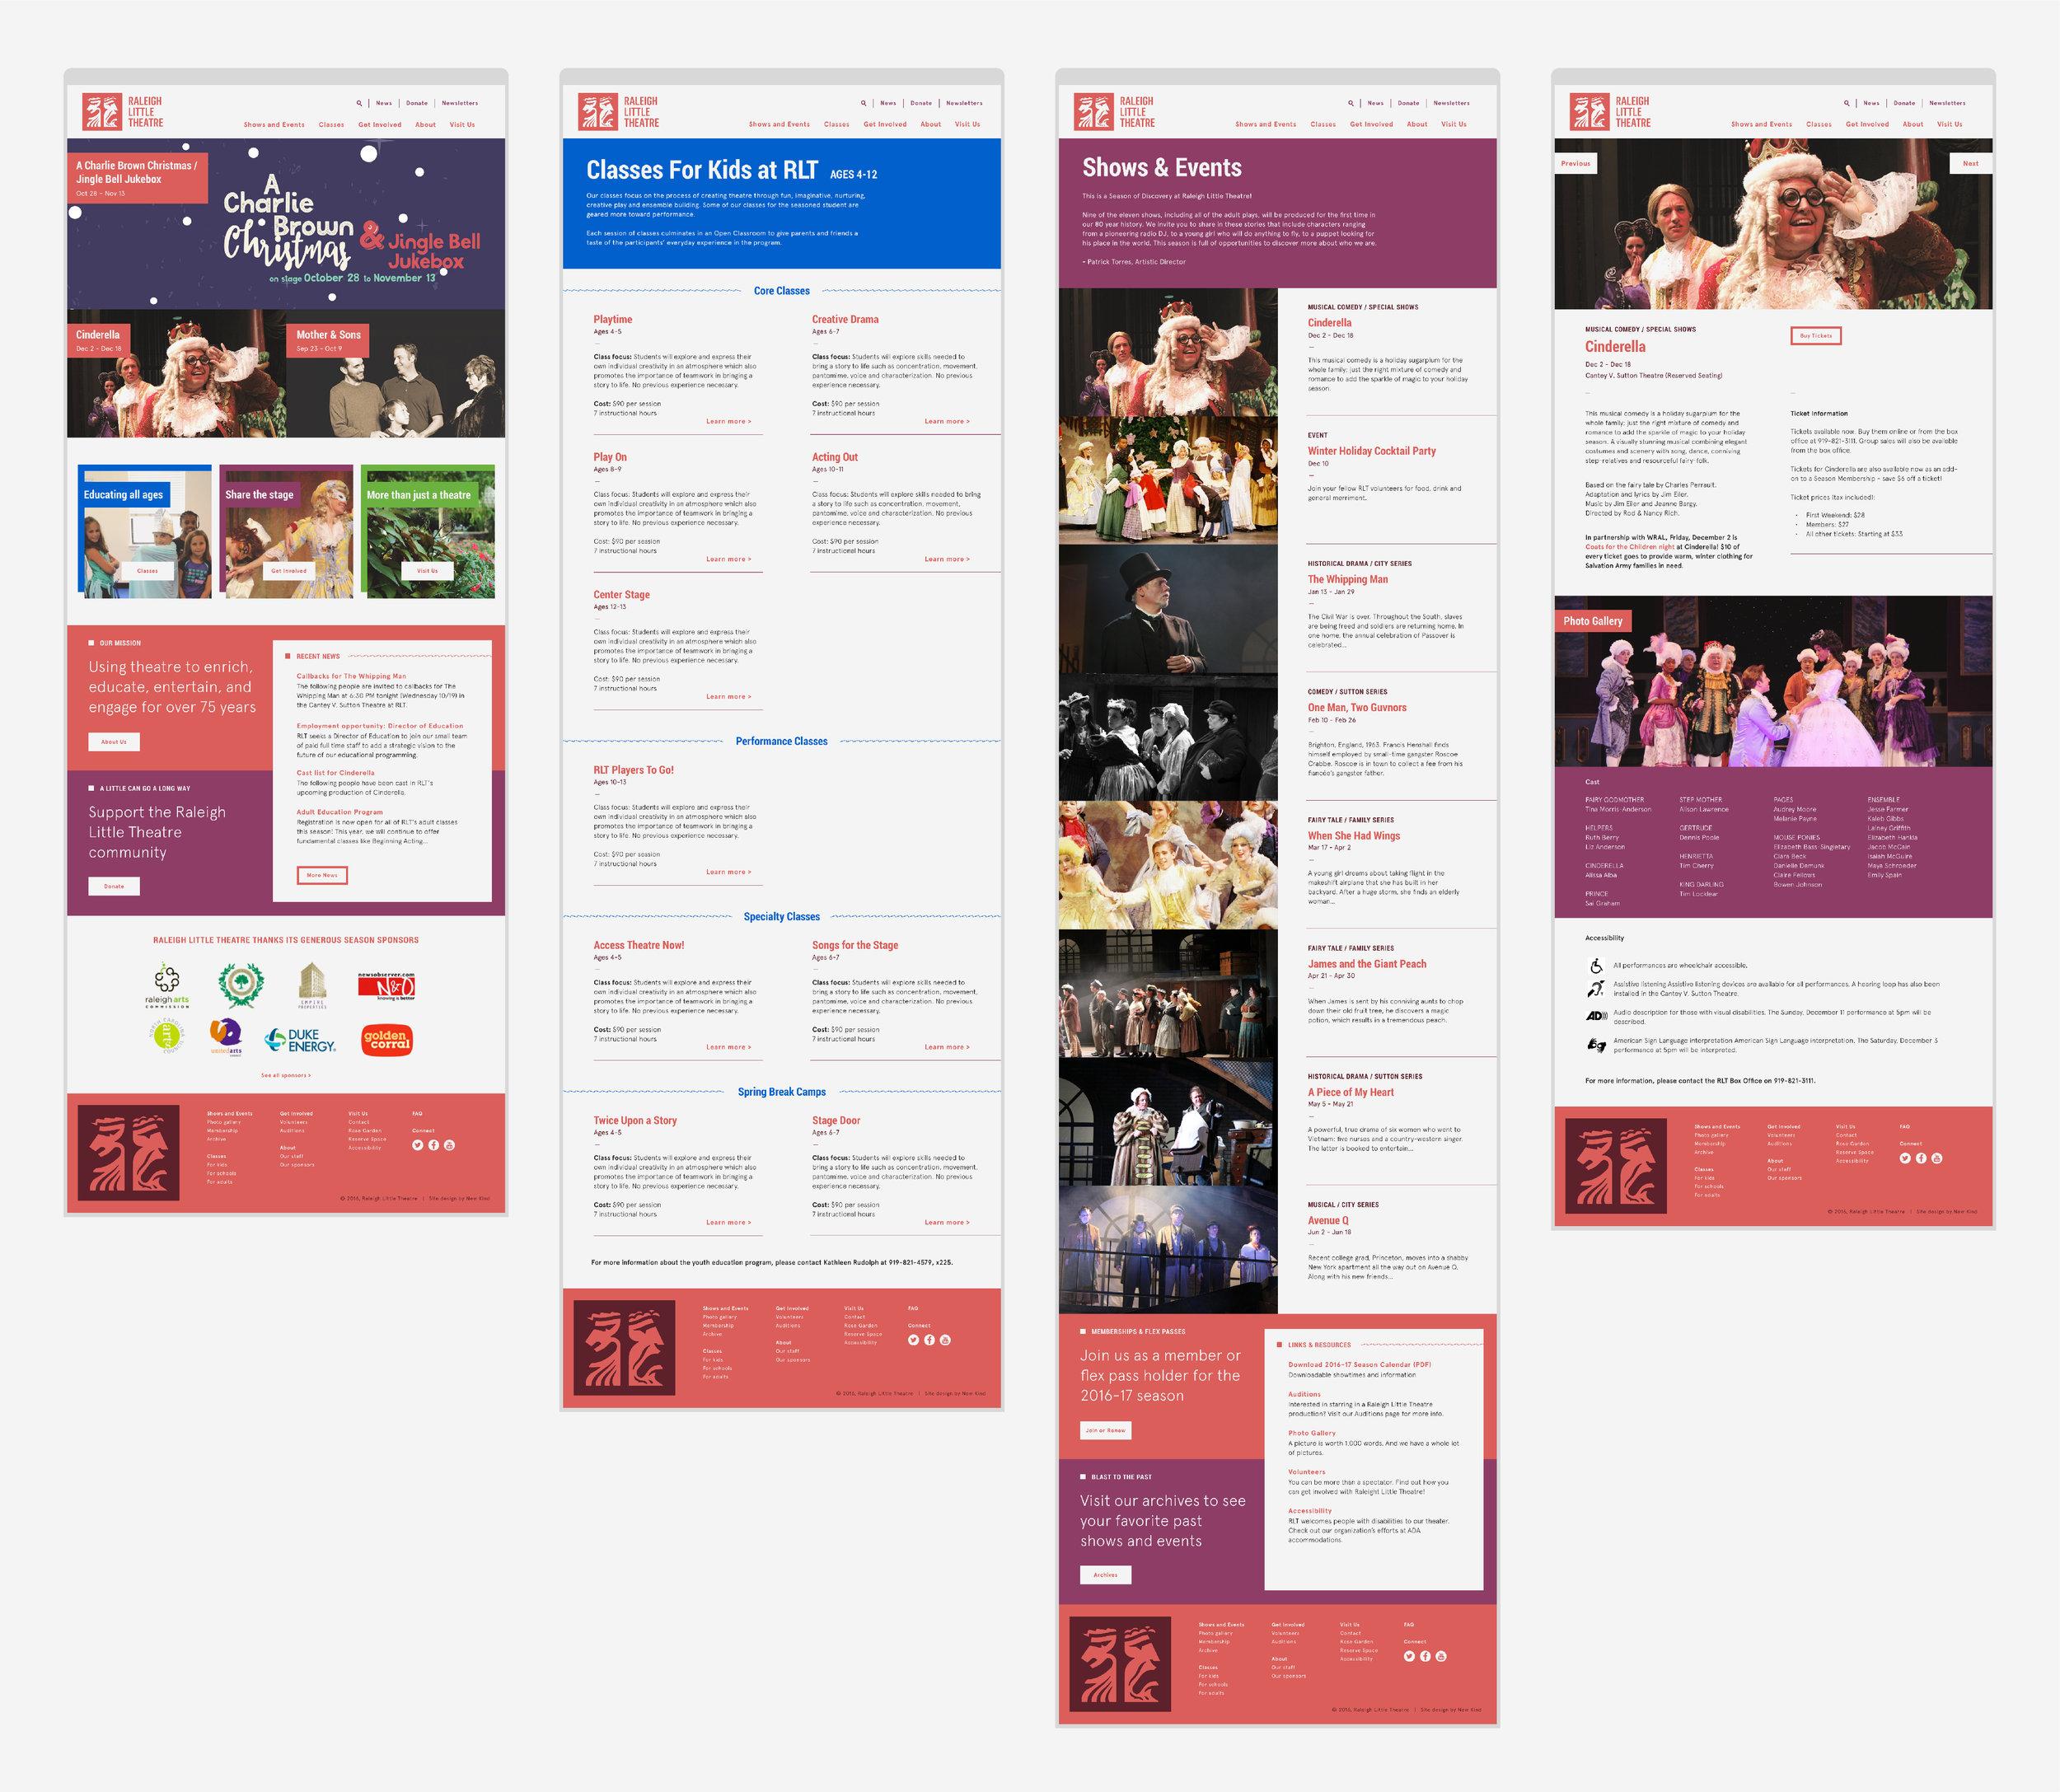 RLT_web_design.jpg